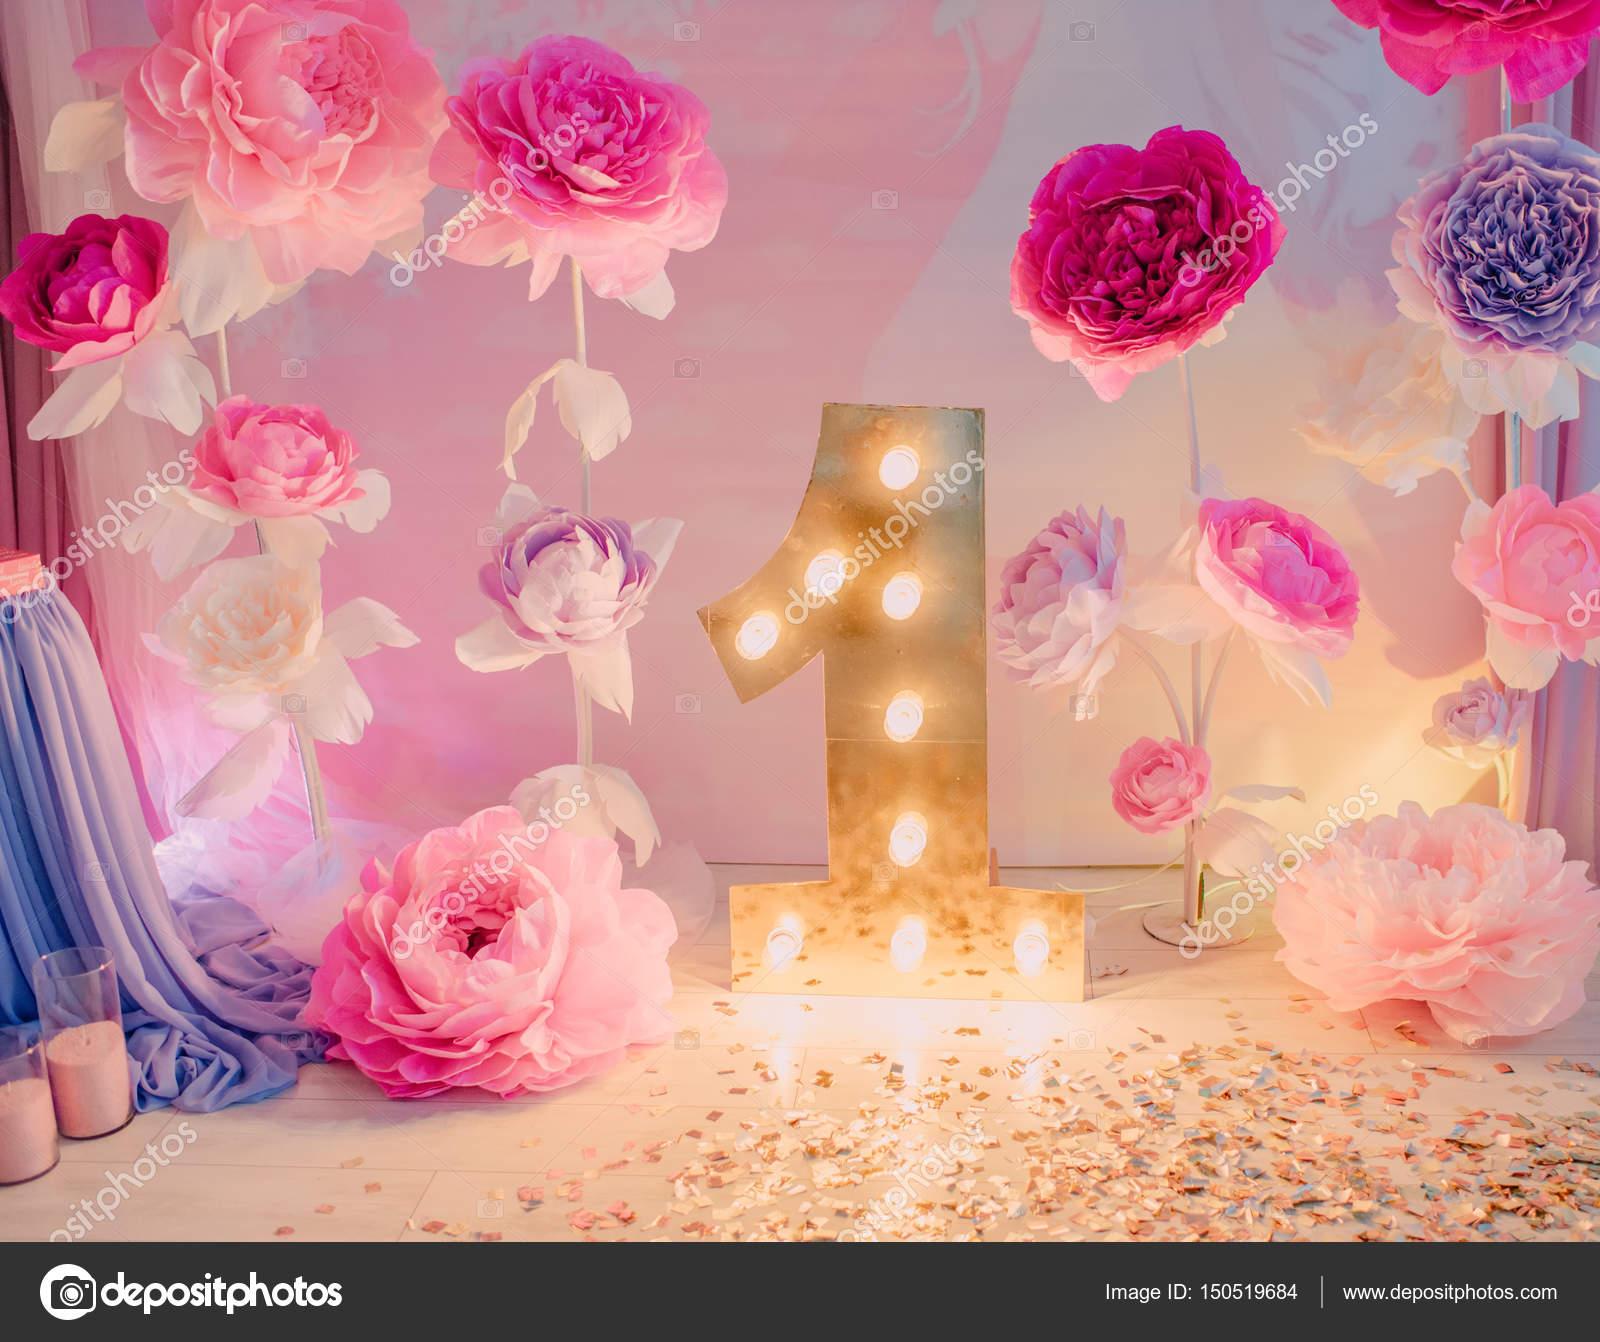 Flores De Cumpleanos Decoraciones Fotos De Stock C Alekuwka 150519684